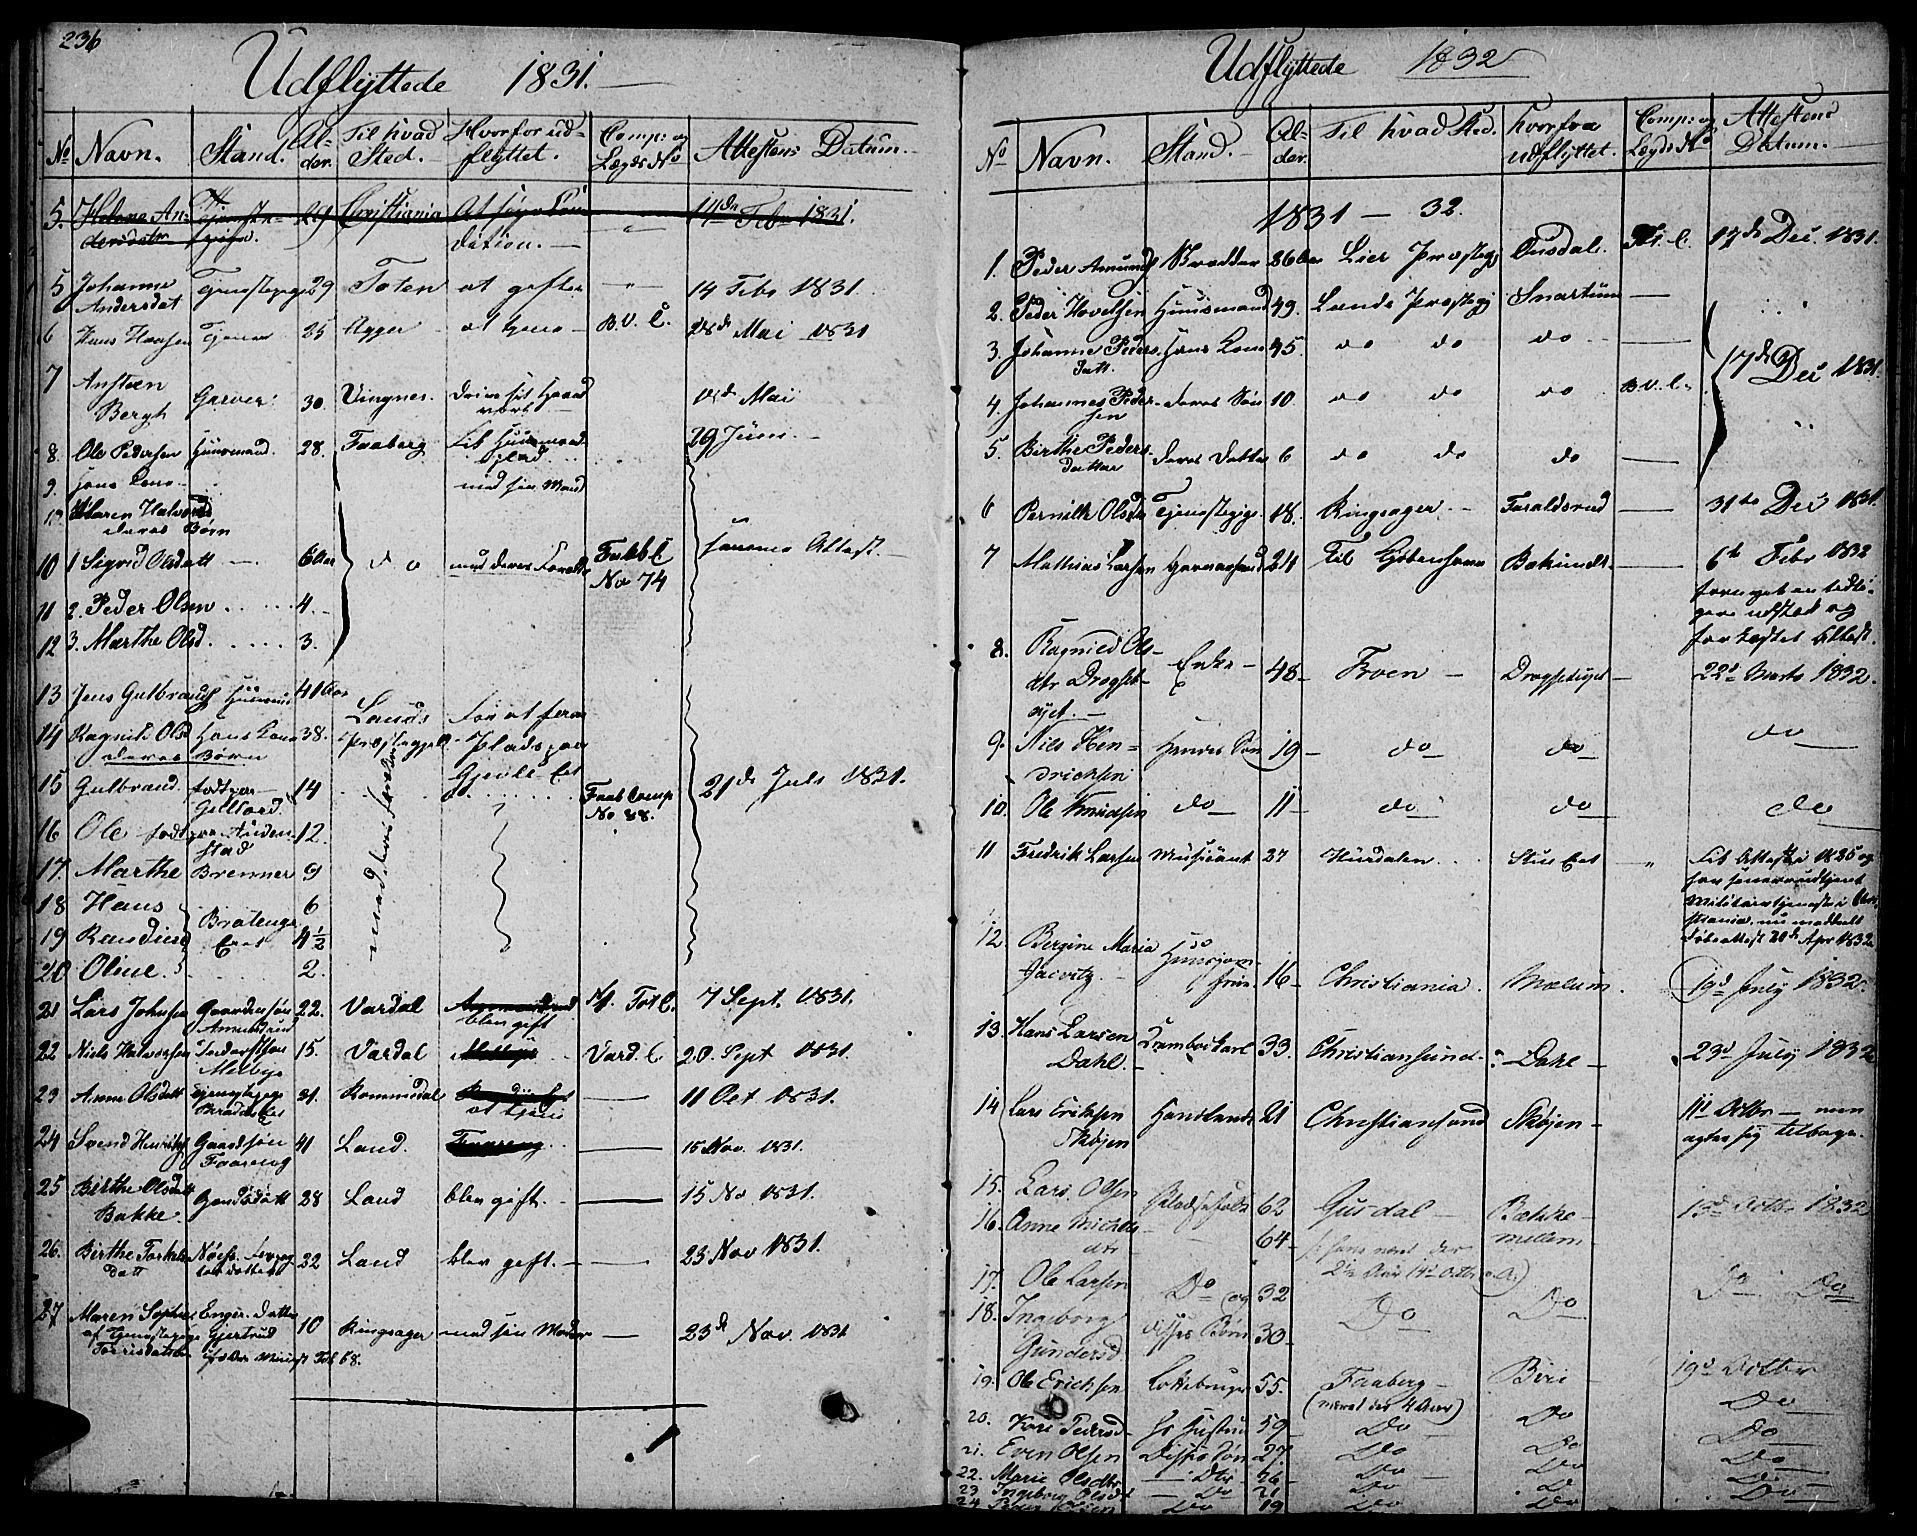 SAH, Biri prestekontor, Ministerialbok nr. 4, 1829-1842, s. 236